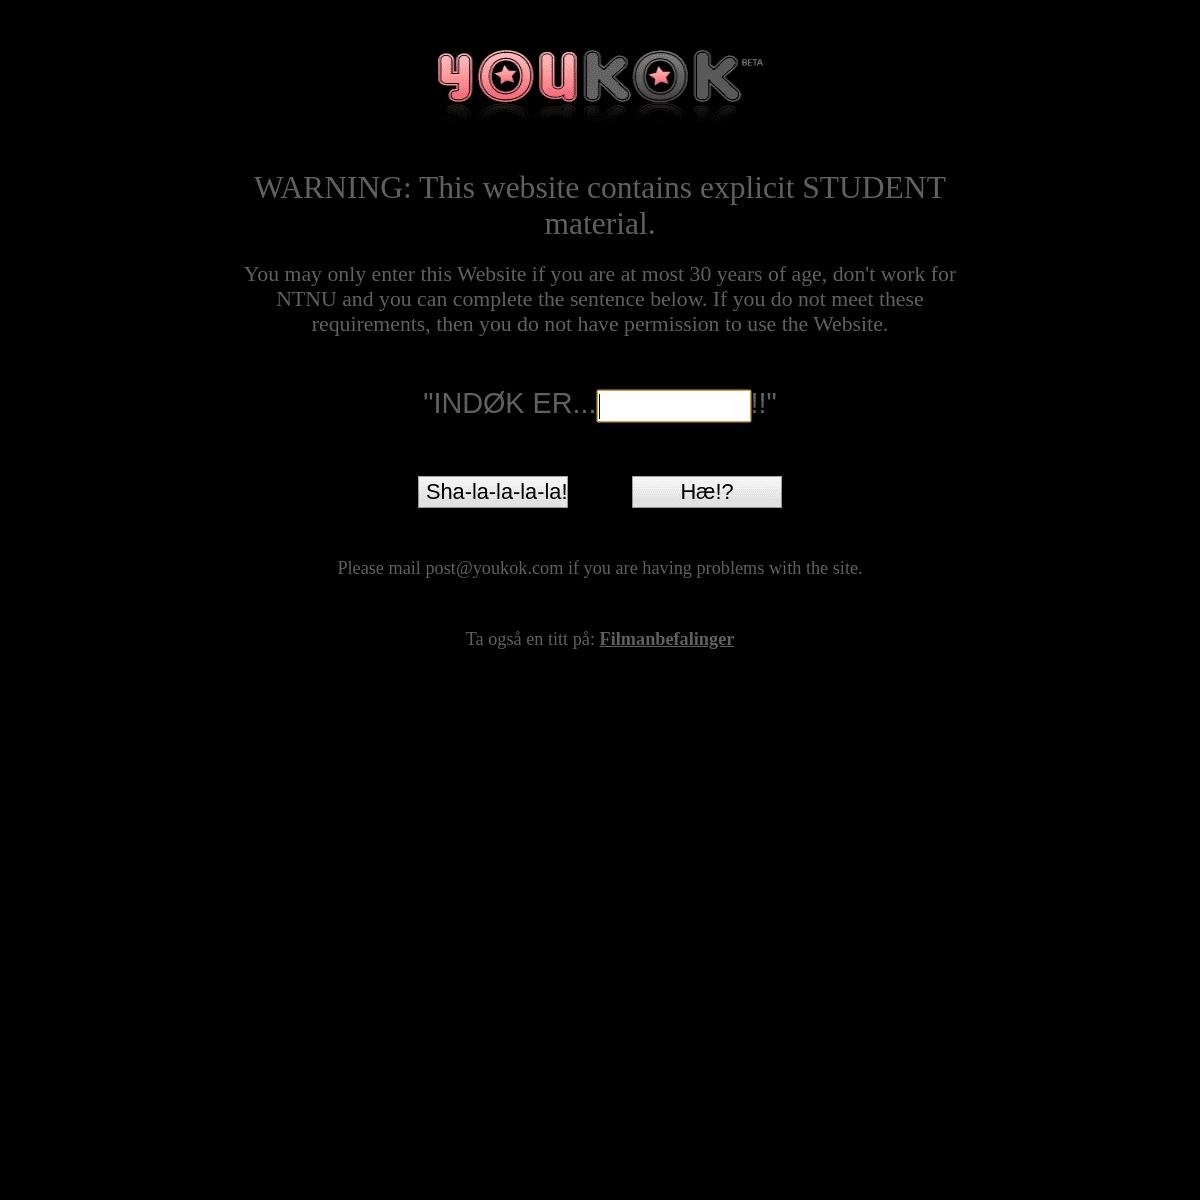 YouKok.com